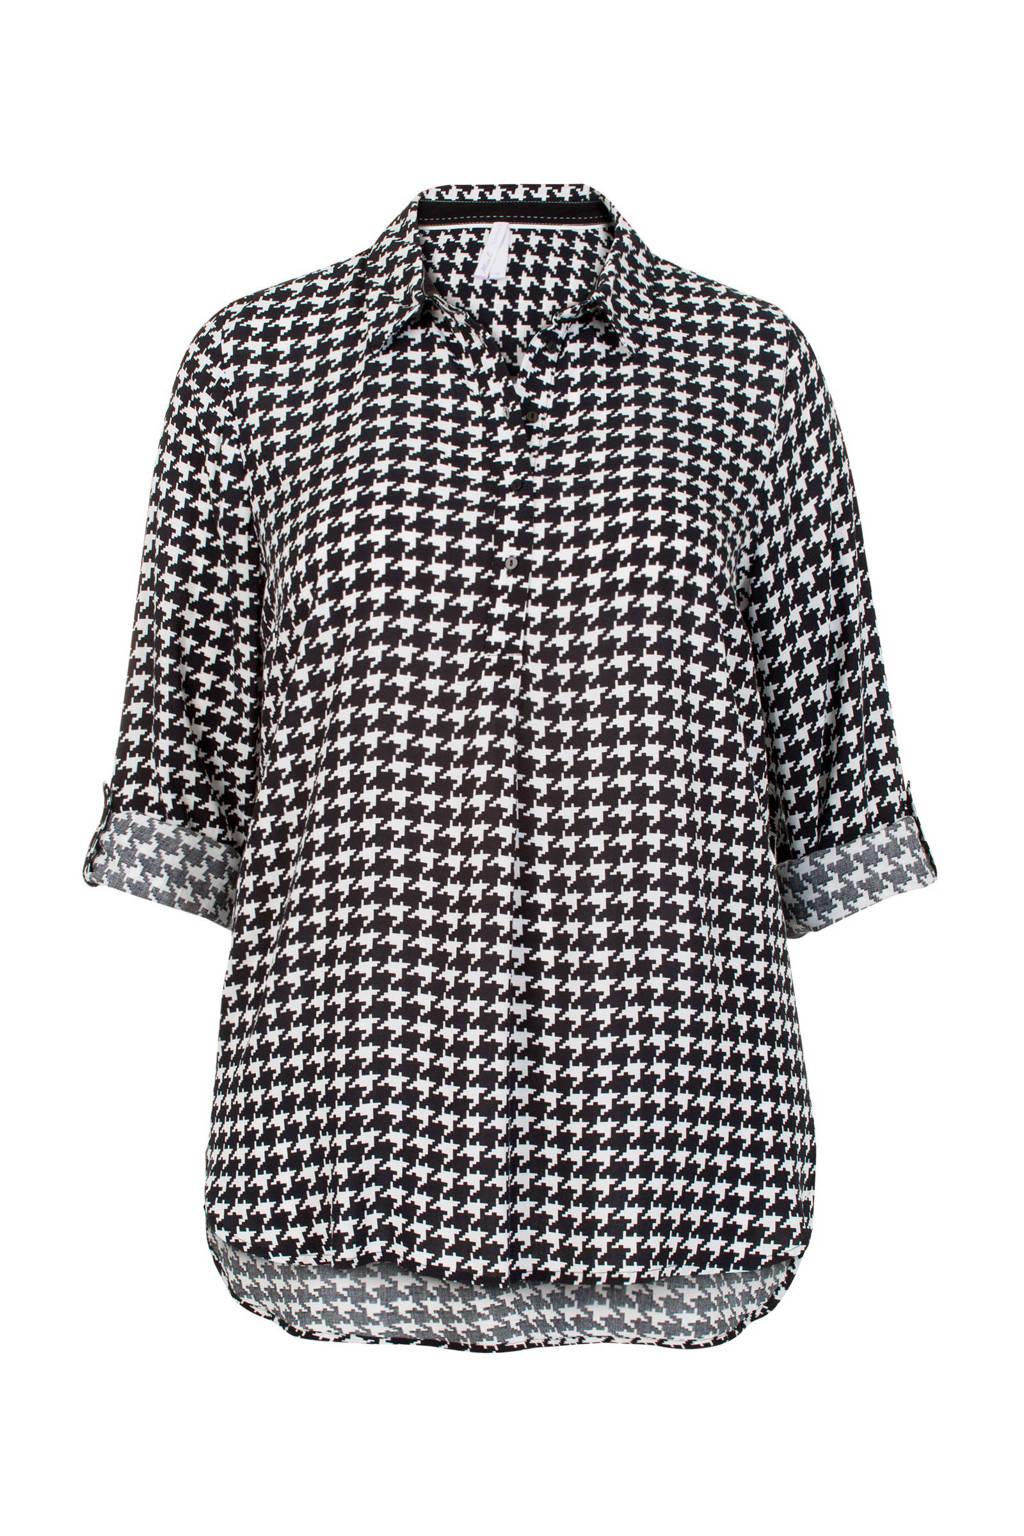 Miss Etam Plus blouse met pied-de-poule zwart/wit, Zwart/wit